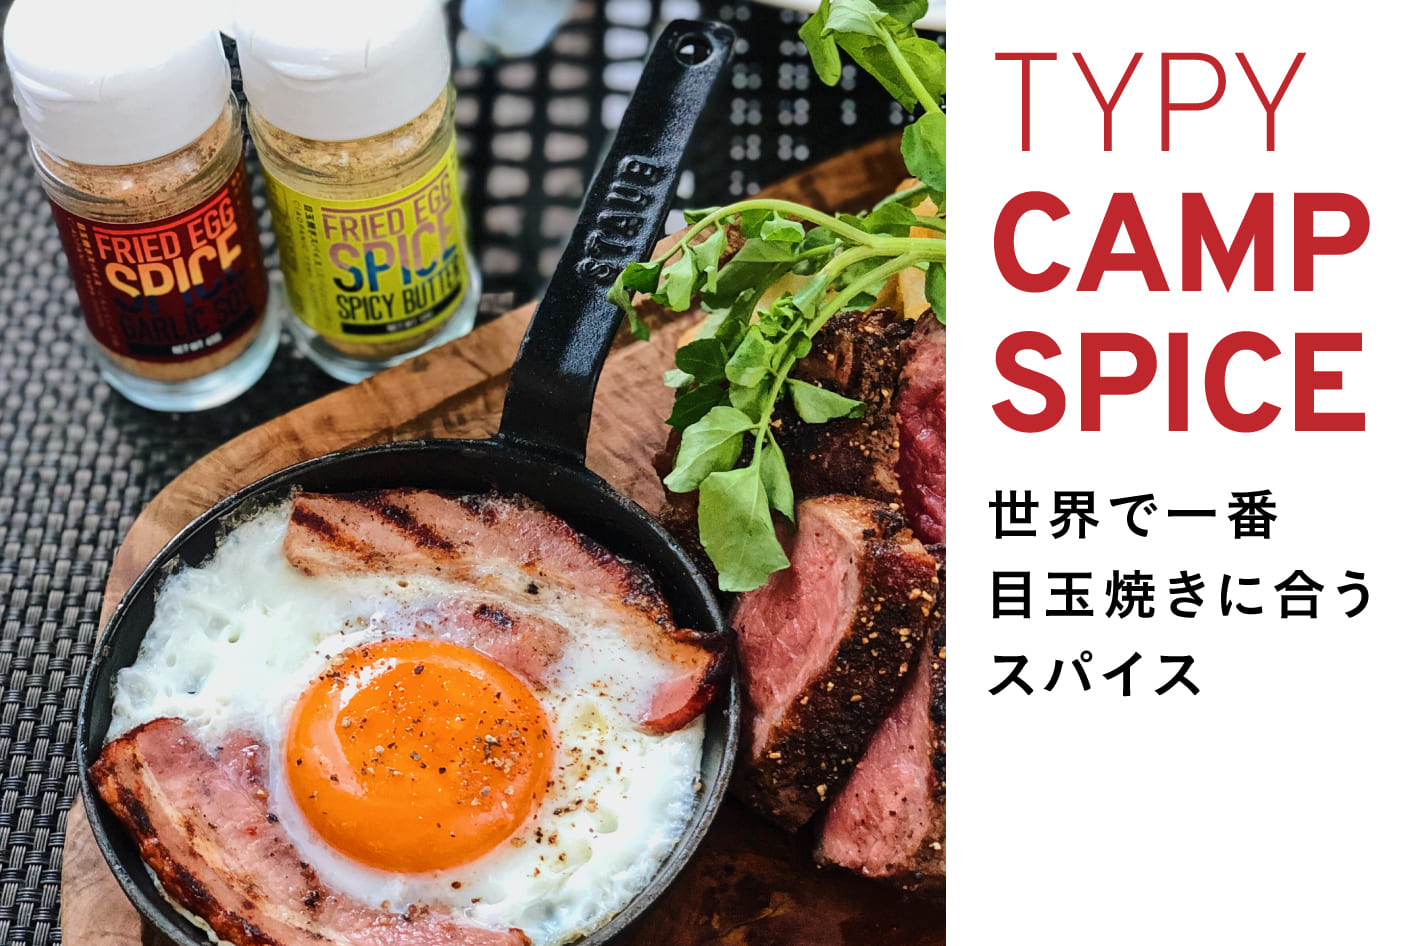 CIAOPANIC TYPY CIAOPANIC TYPYから【世界で一番目玉焼きに合う】 オリジナルスパイス「TYPY CAMP SPICE」が登場!!